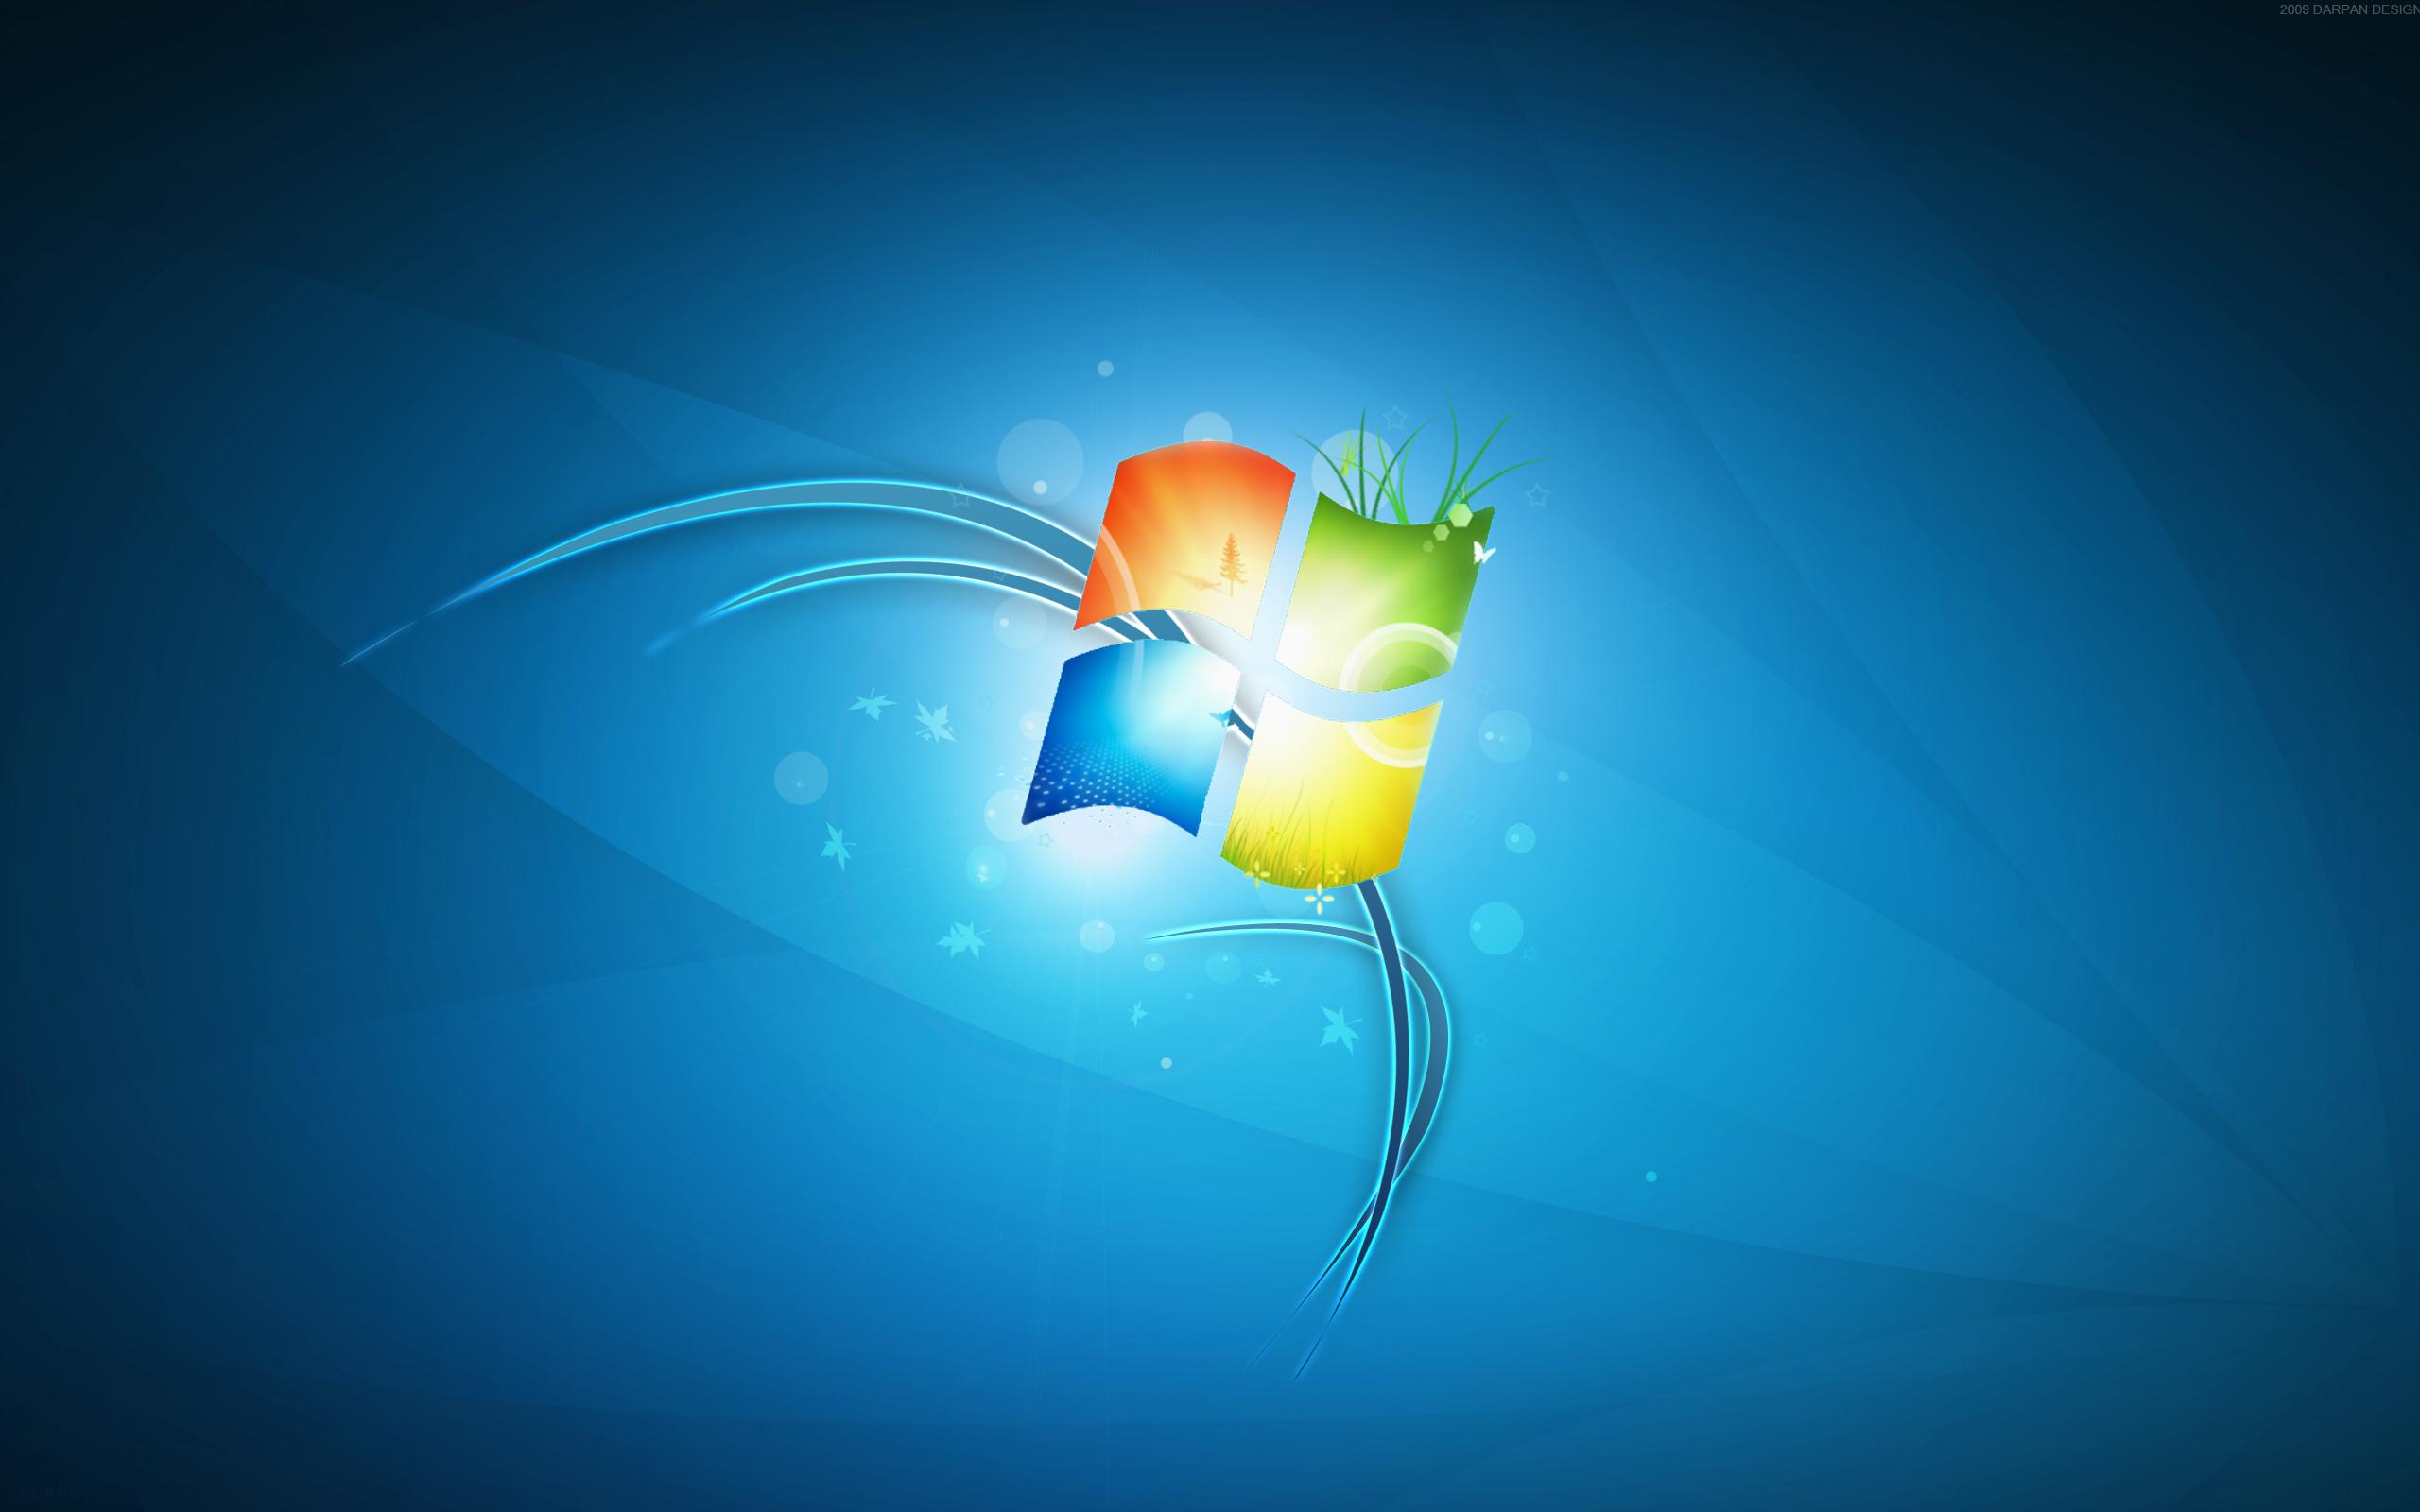 Microsoft Desktop Backgrounds Wallpapers9 2560x1600